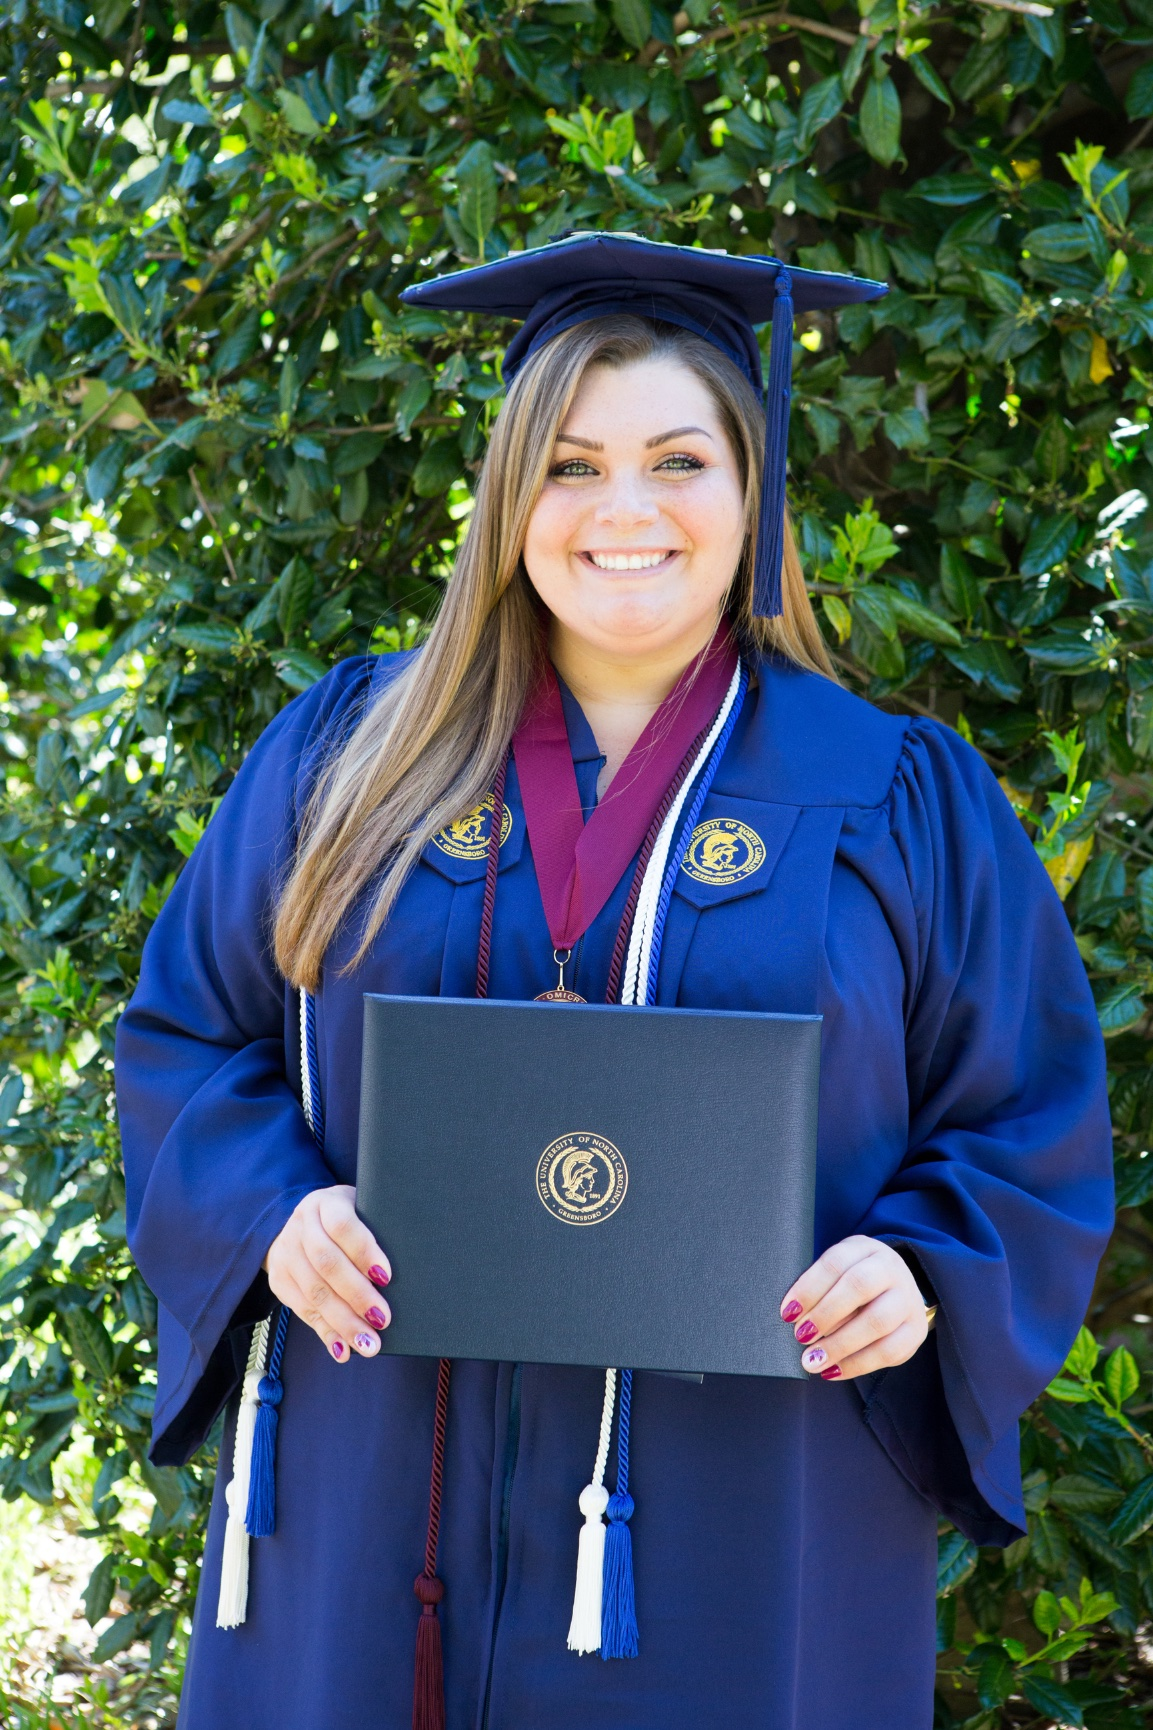 Unc Greensboro A Graduate Receives Her Diploma Elizabeth Larson